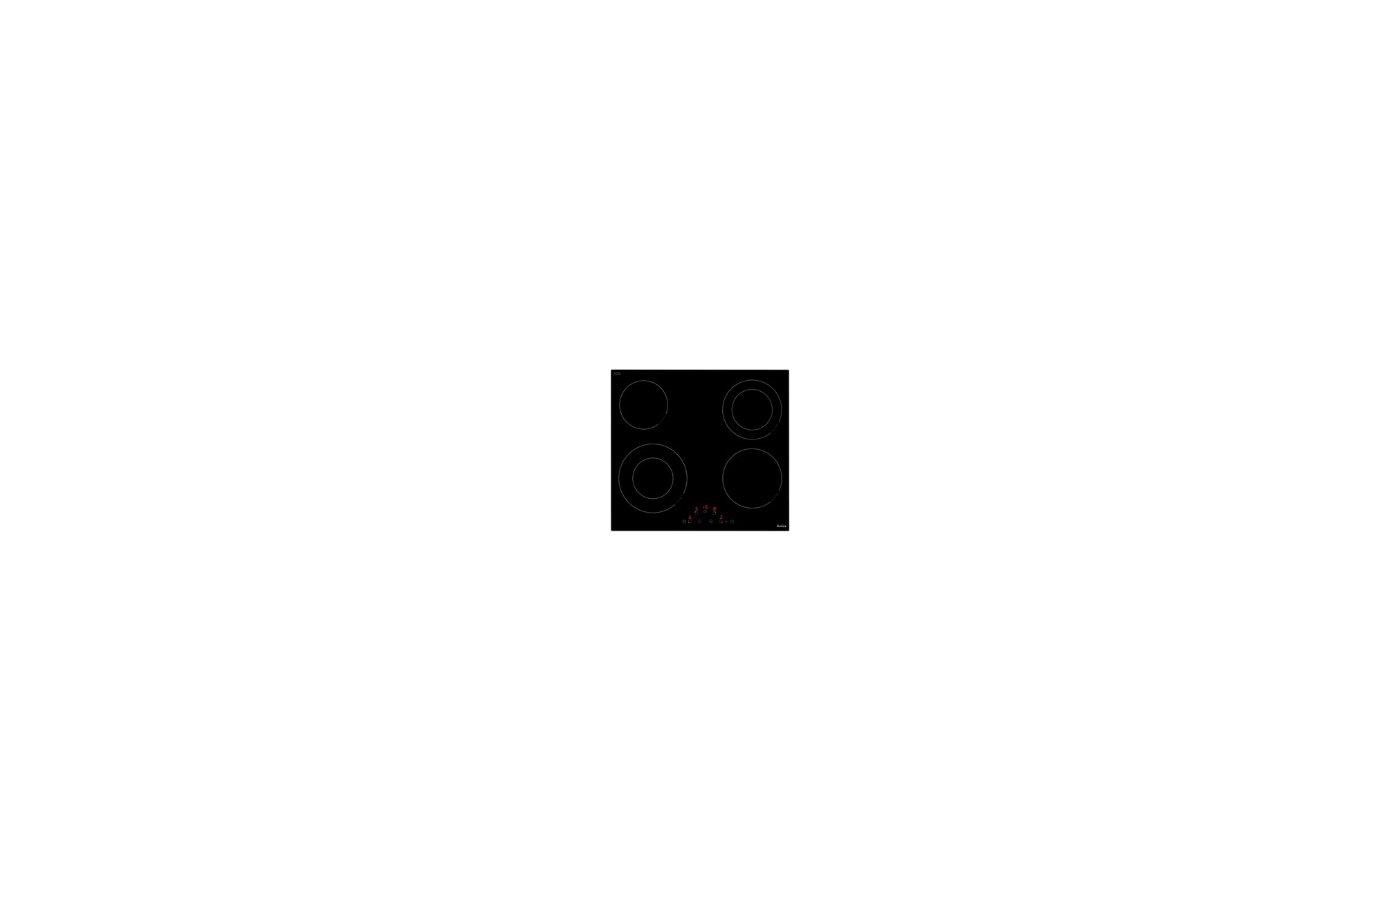 Варочная панель HANSA BHC 63508